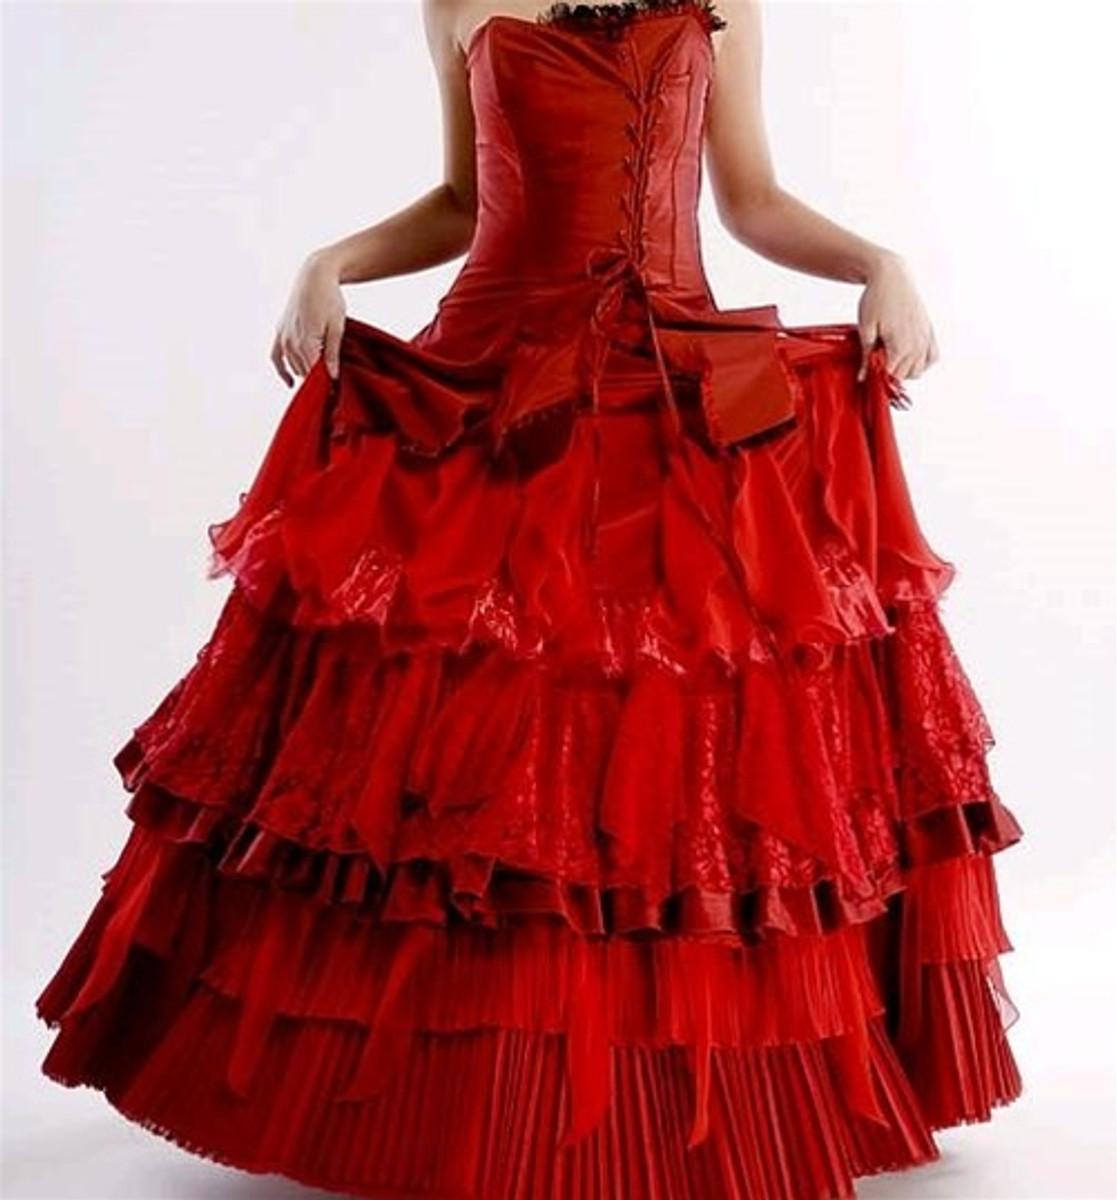 Red Corset Wedding Dress